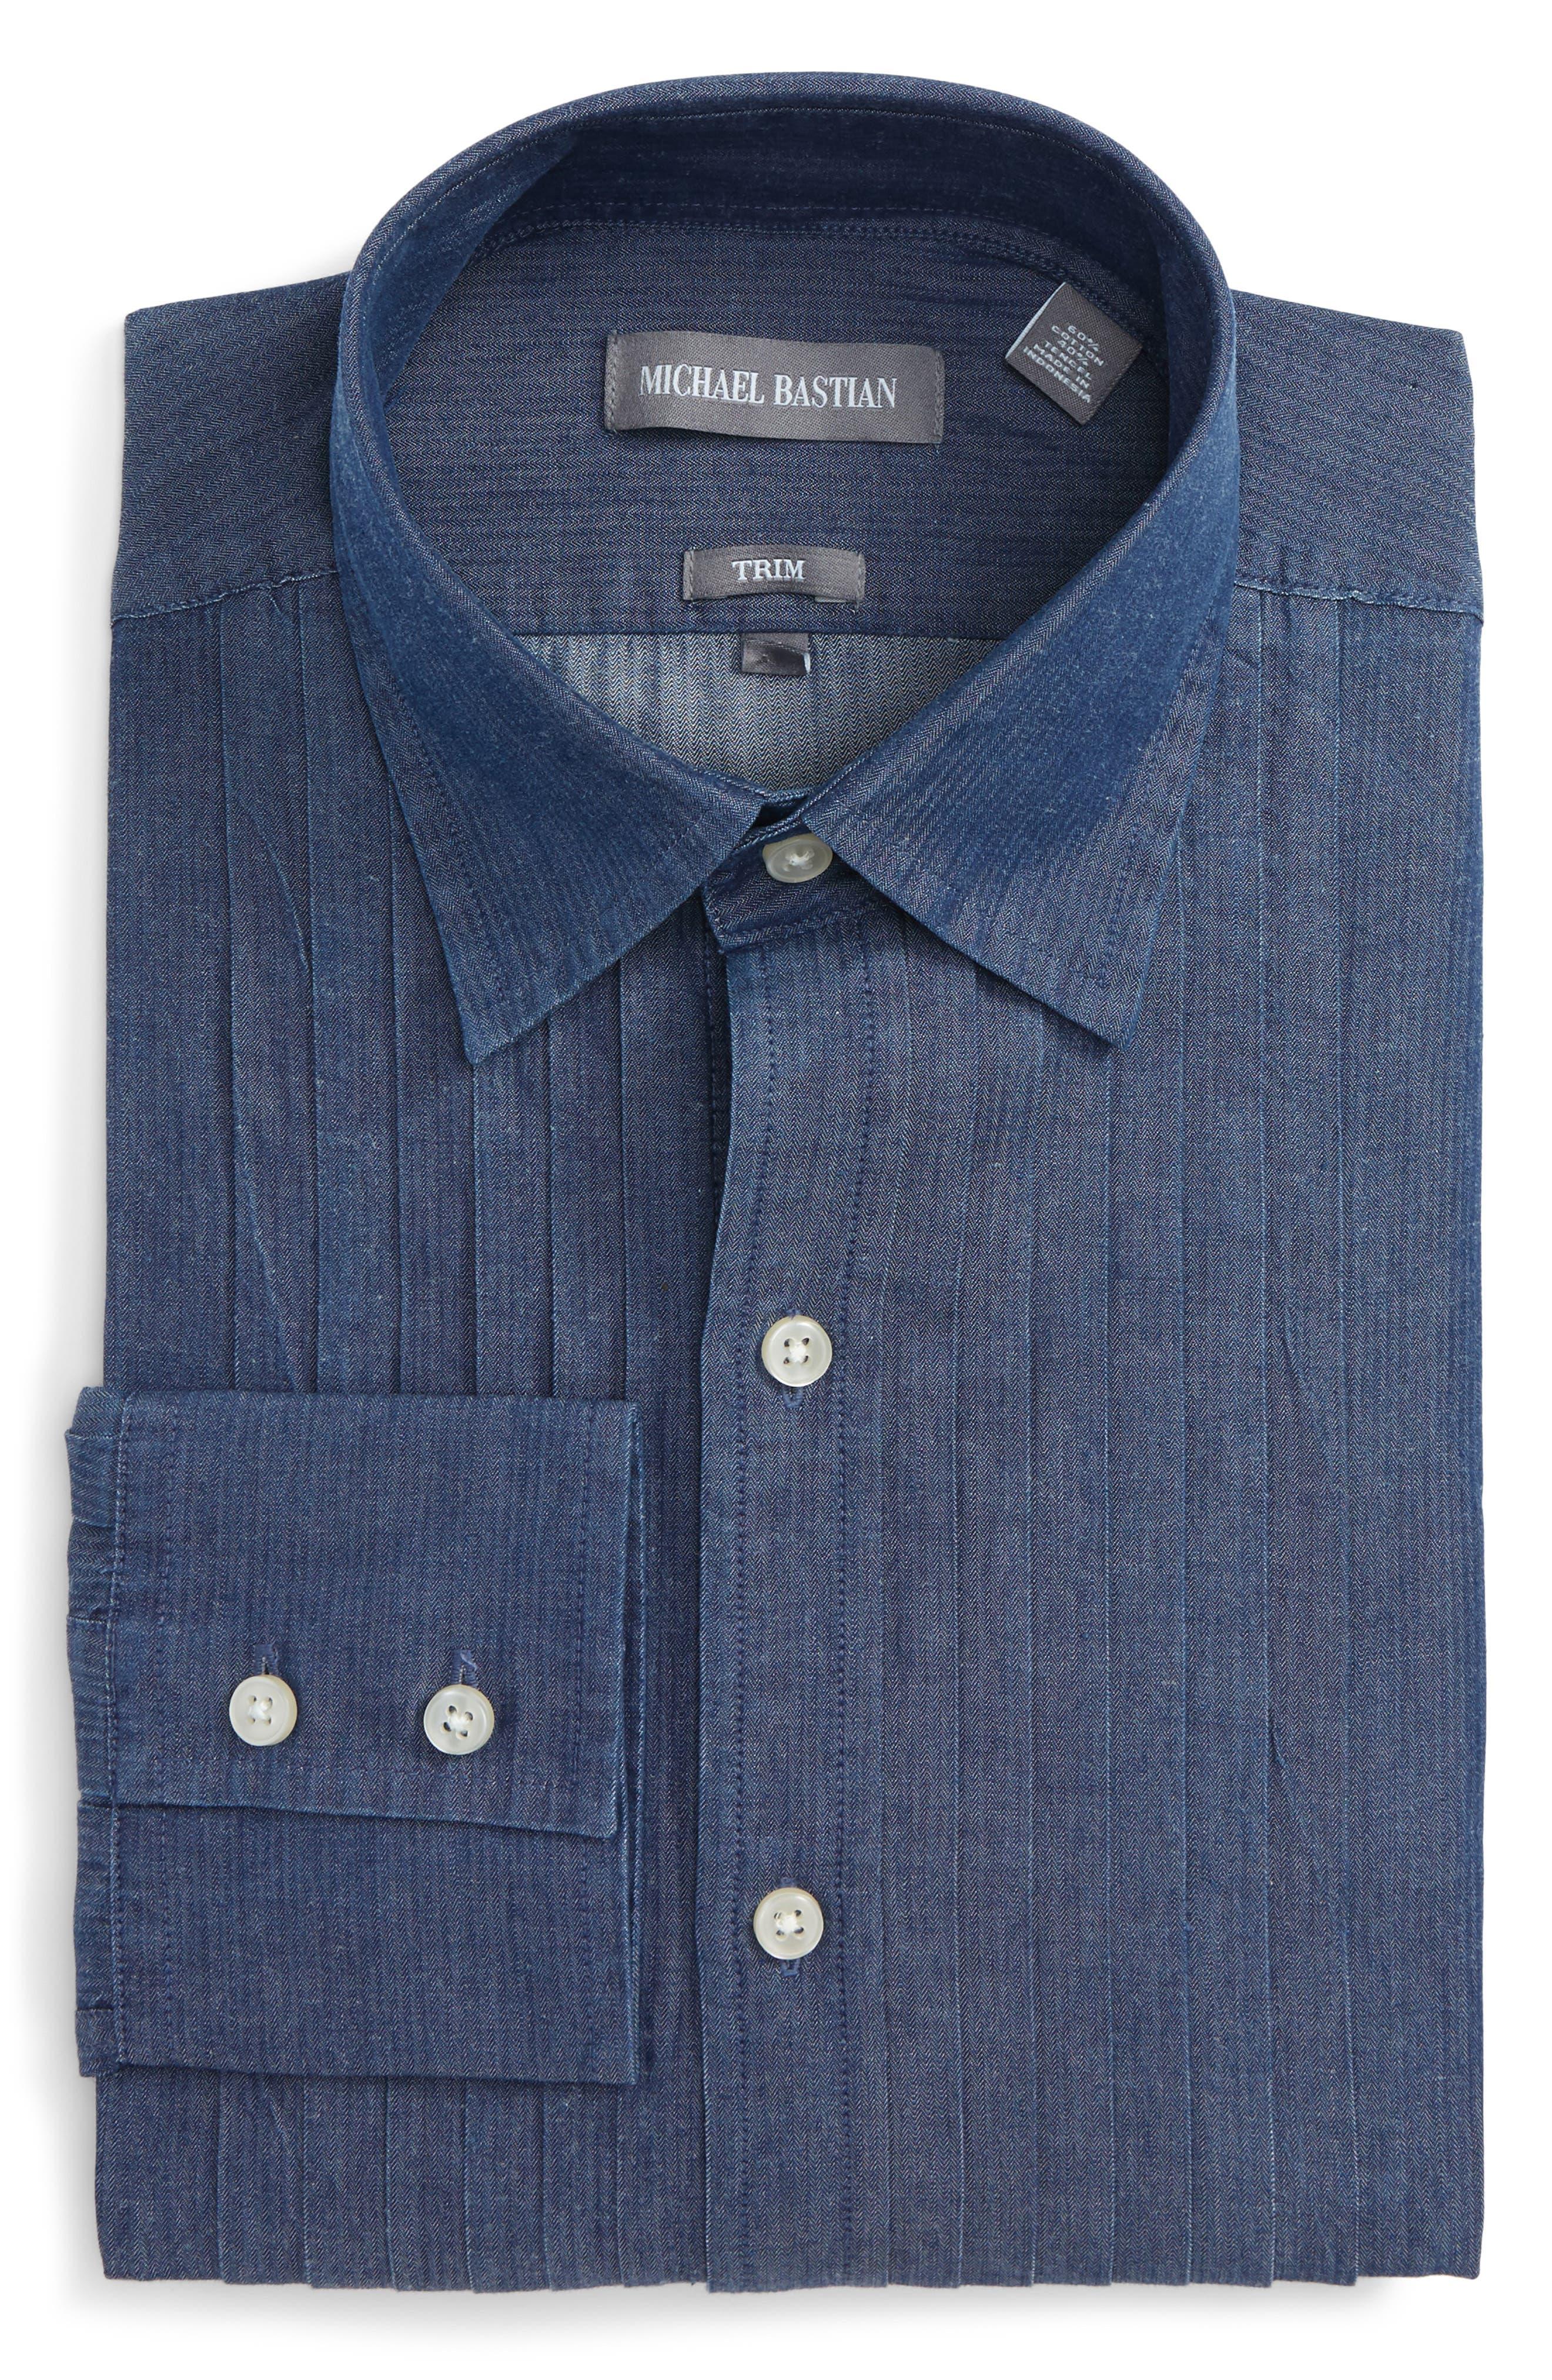 Trim Fit Denim Dress Shirt,                         Main,                         color, 402